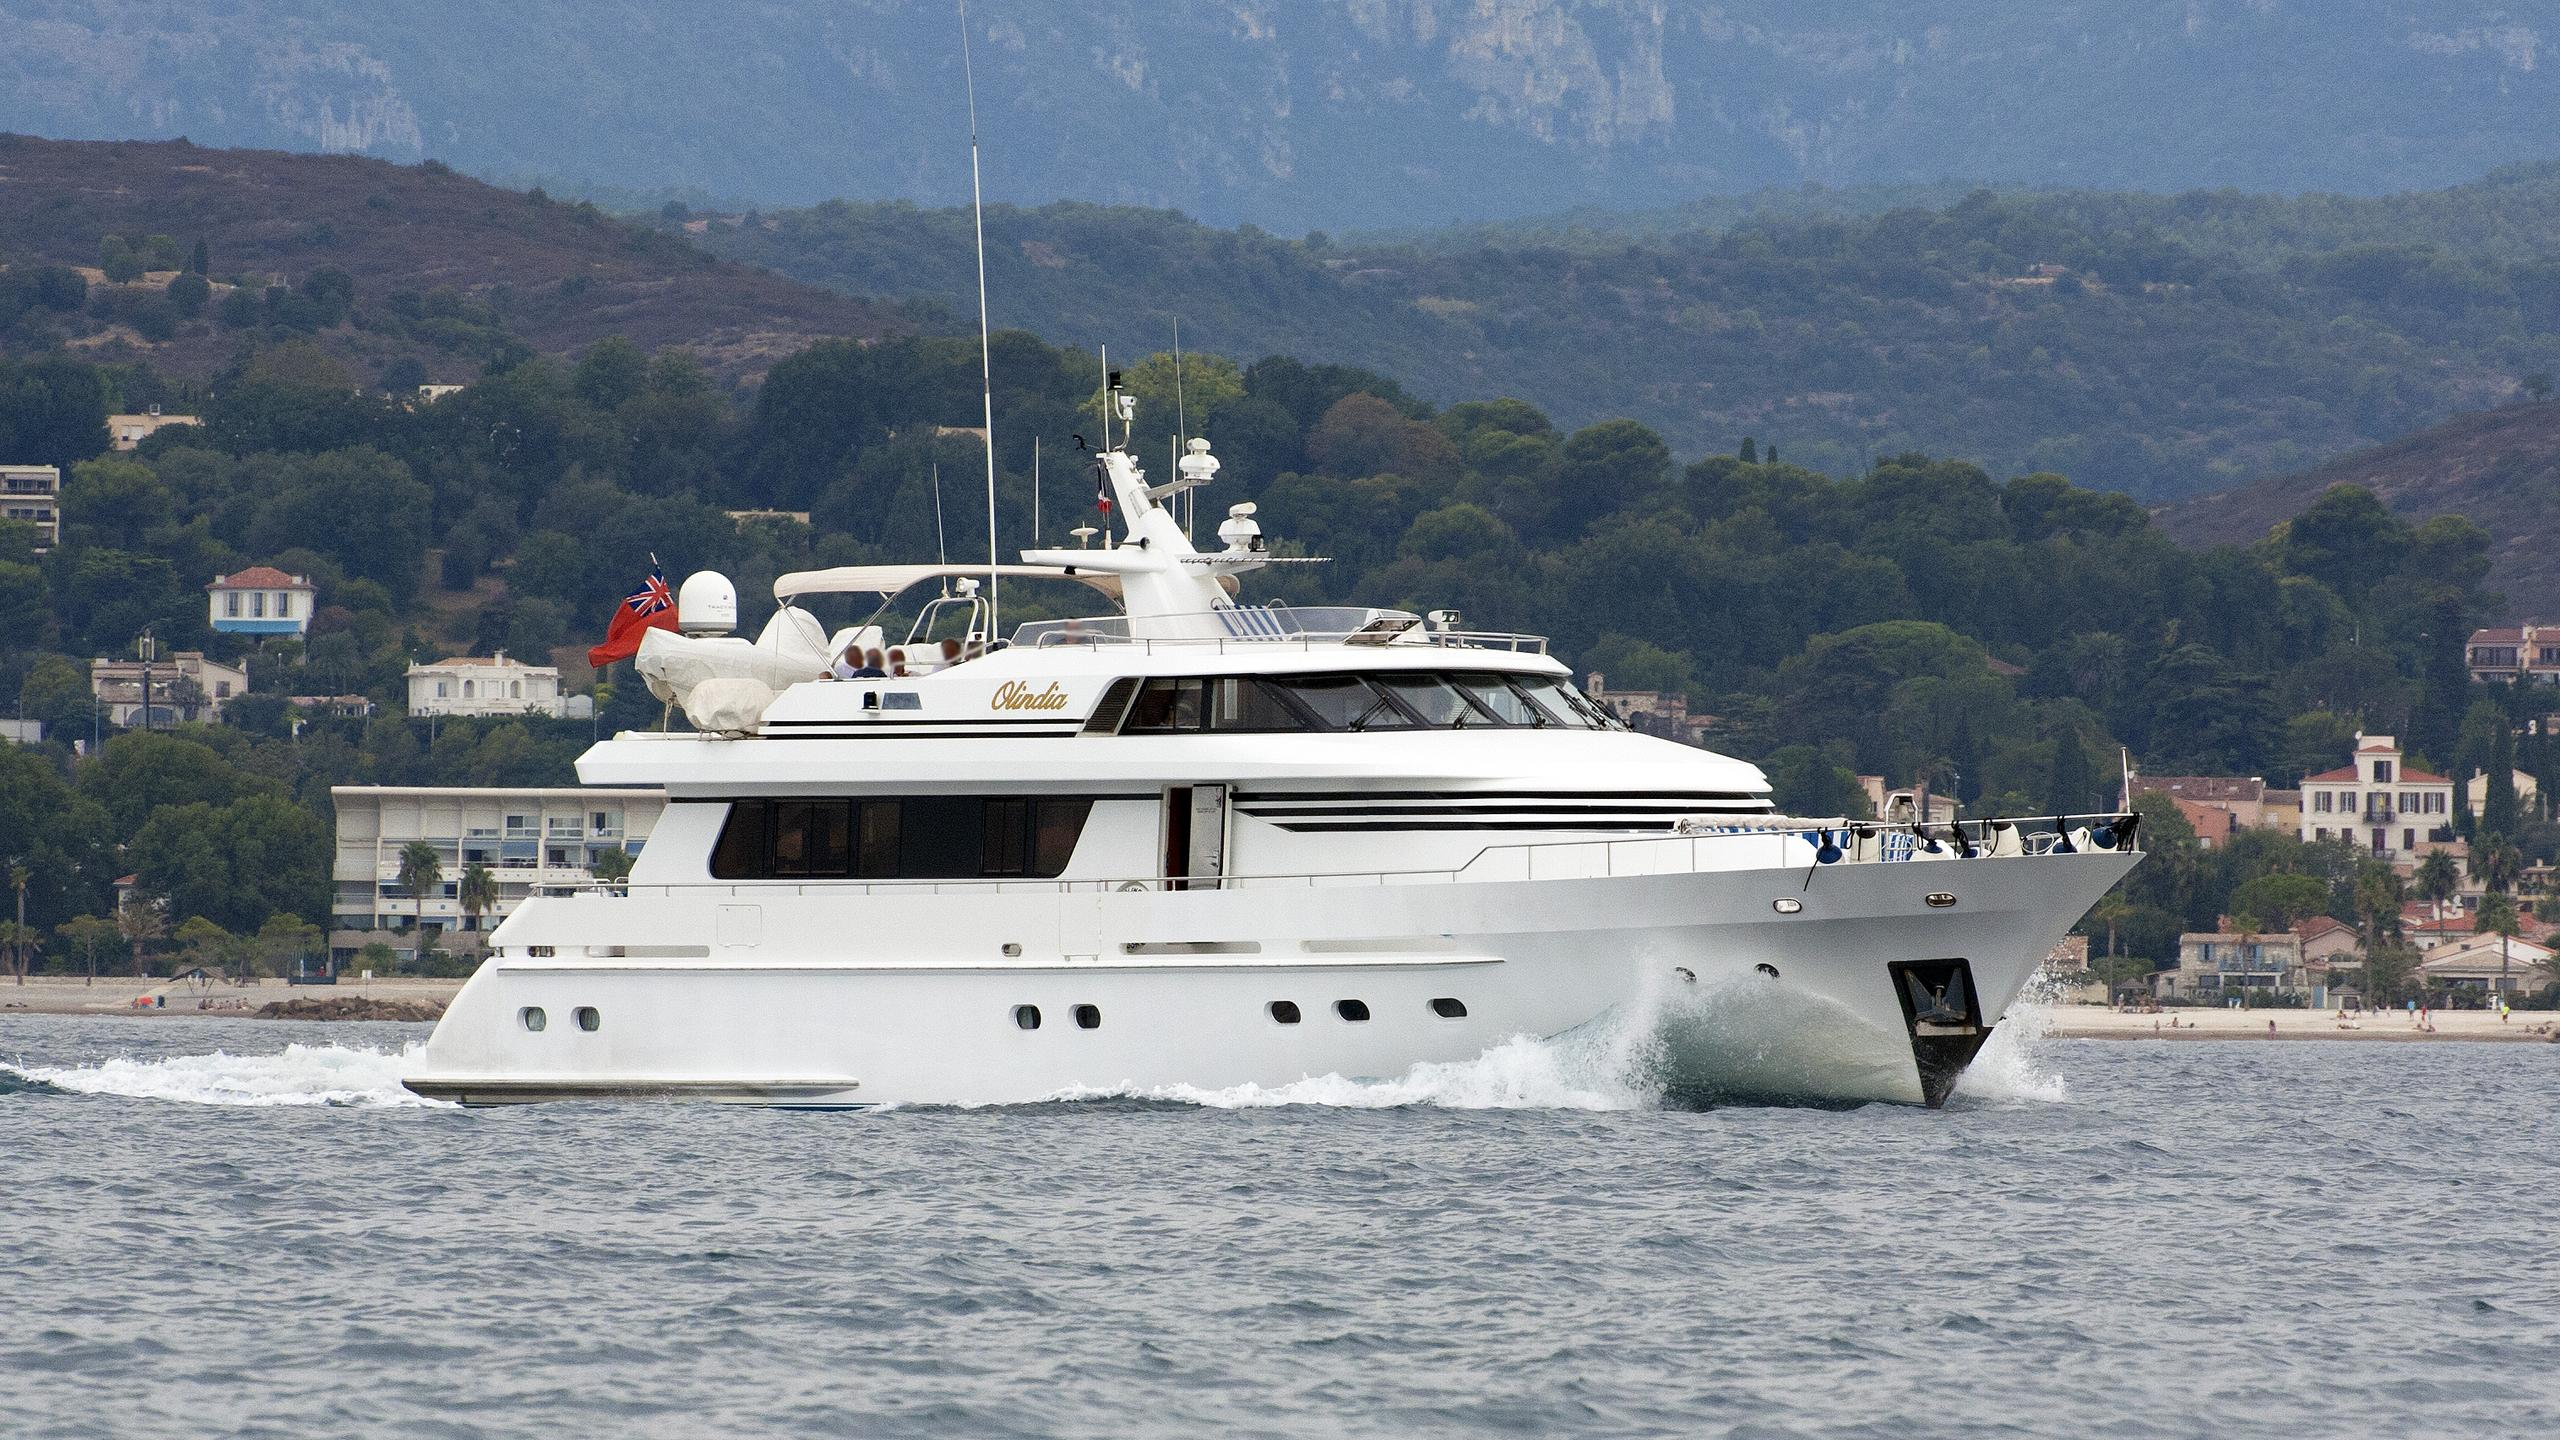 olindia-motor-yacht-lowland-neth-ship-87-1994-26m-half-profile